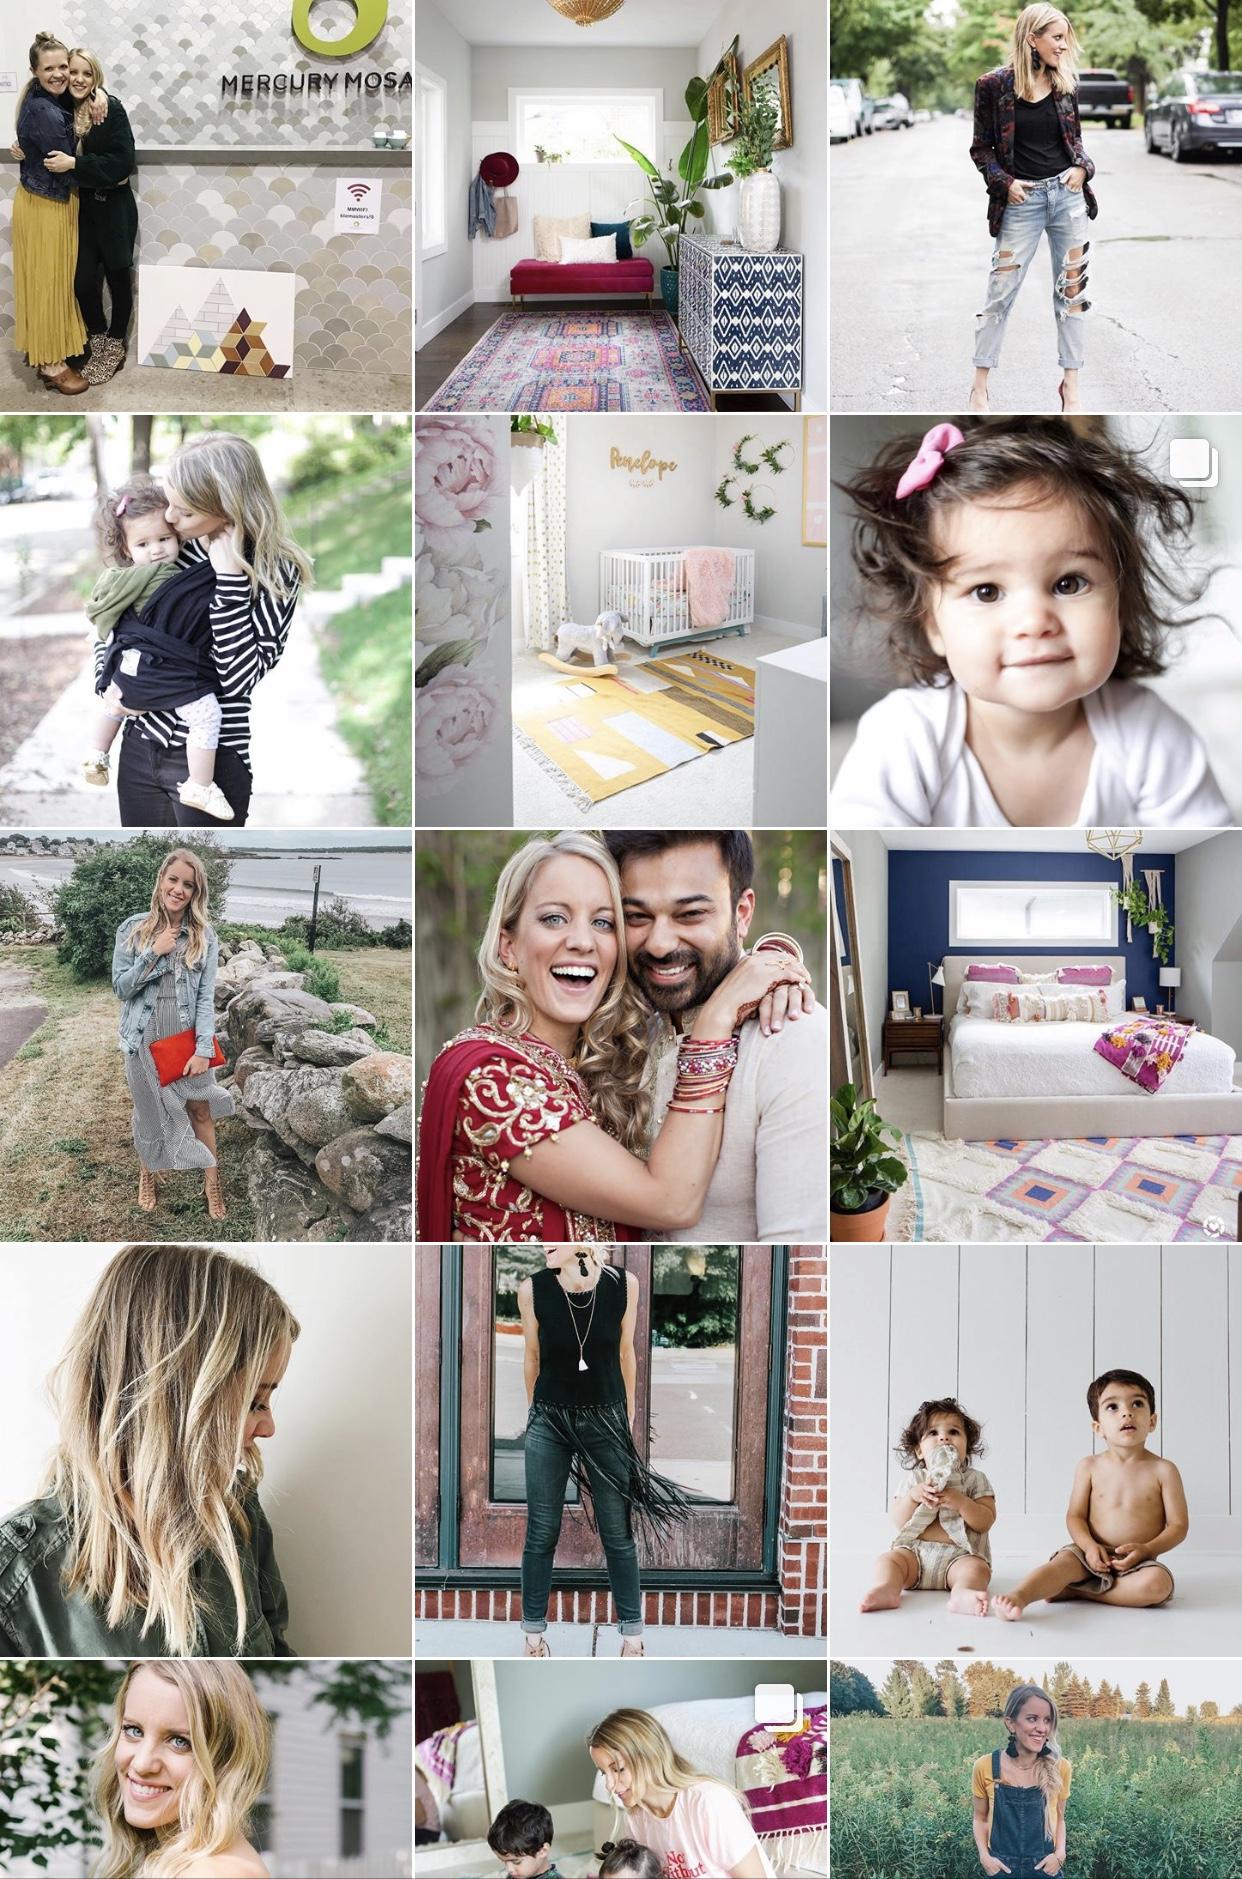 Instagram marketing tips and tricks